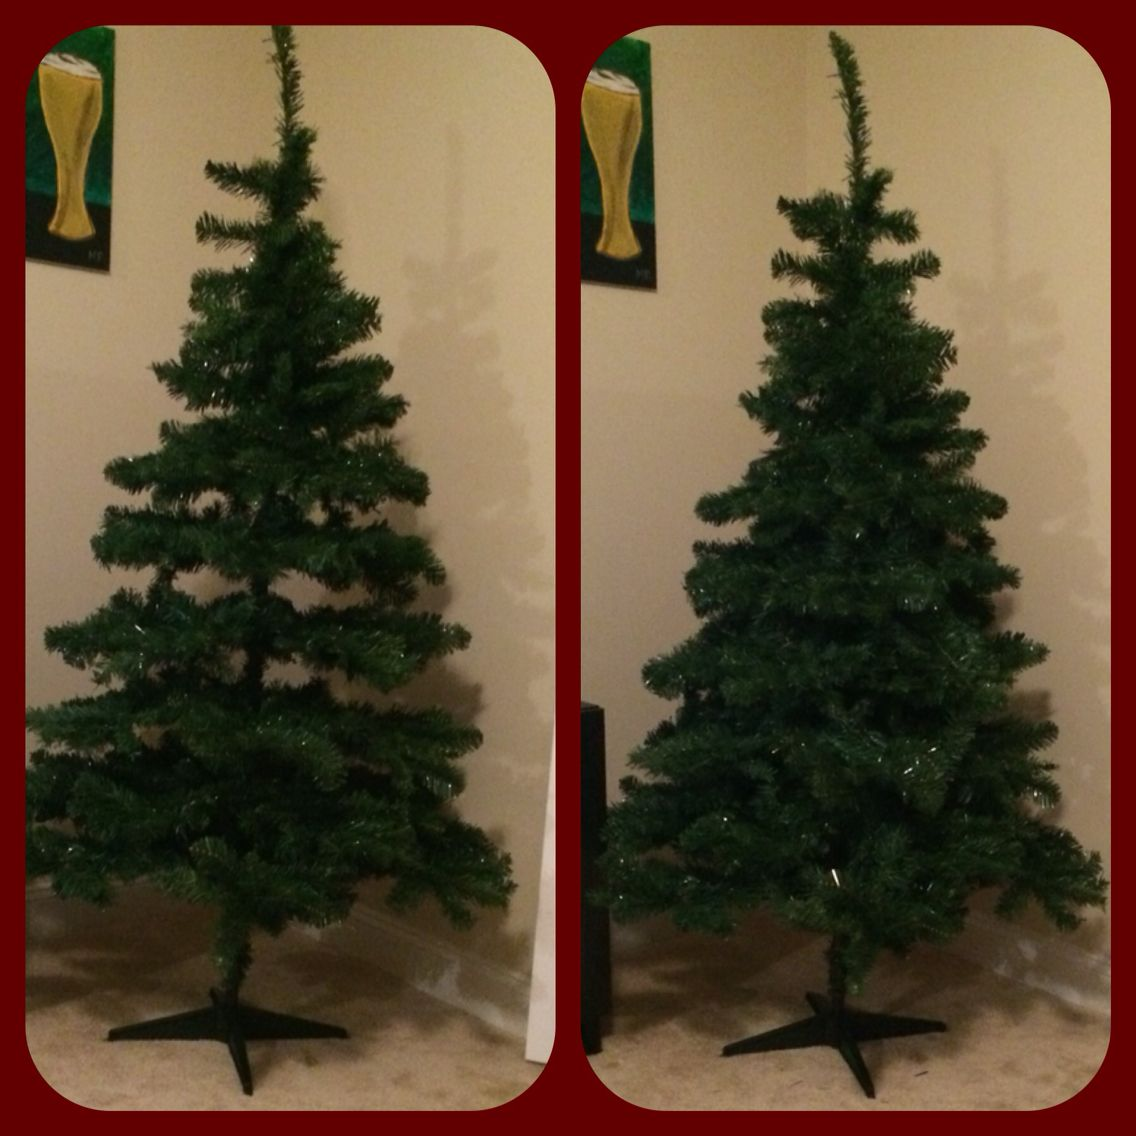 Pin By Kristen Karmazyn On Holidays Pinterest Mesh Christmas Tree Tomato Cage Christmas Tree Christmas Diy